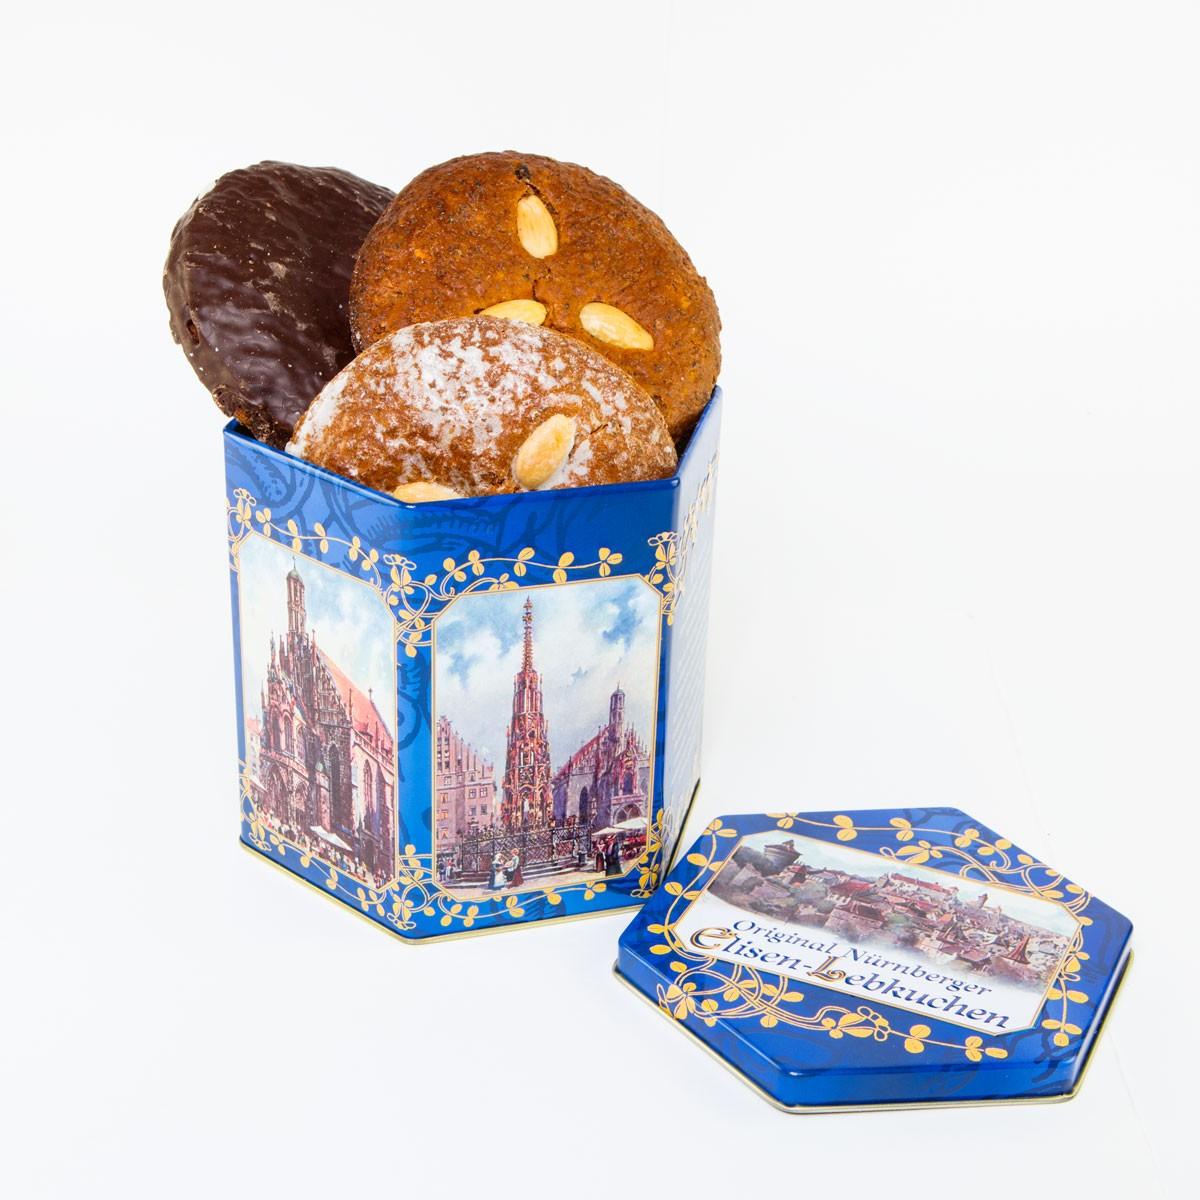 Original Nürnberger Elisenlebkuchen